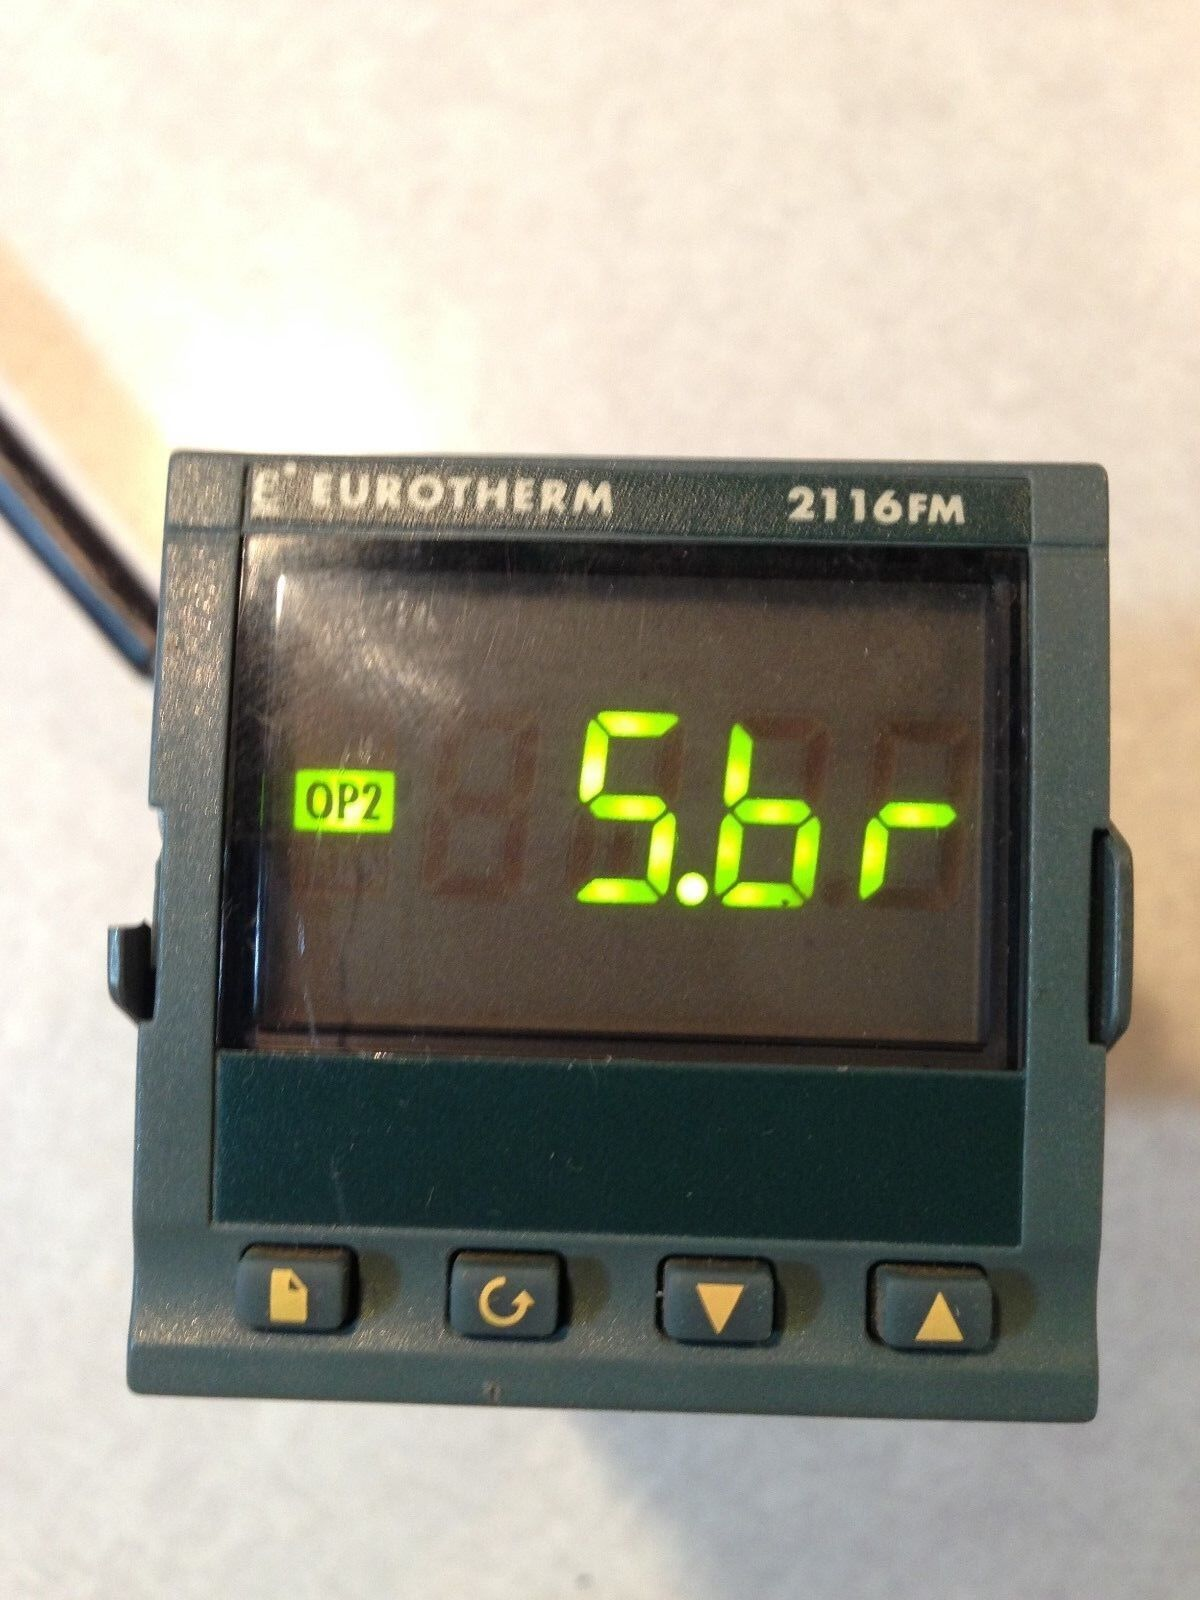 Euredherm 2216 Temperature Control Programmable 2216 FM VH ENG FH J -340 2192 F